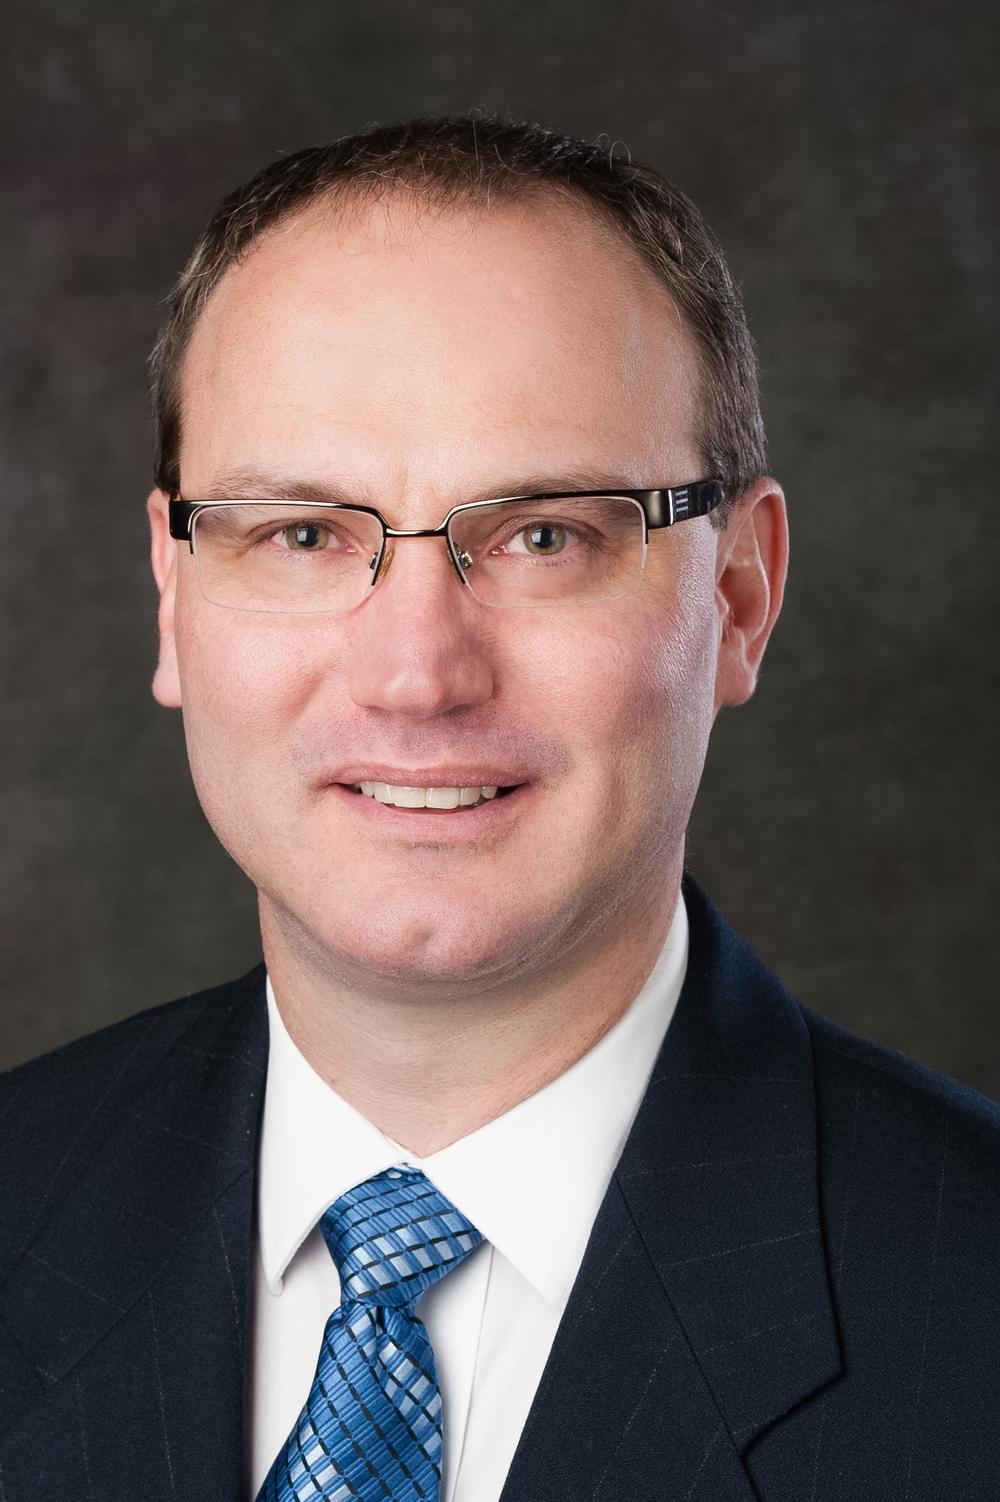 Dr. Eric Bouchard